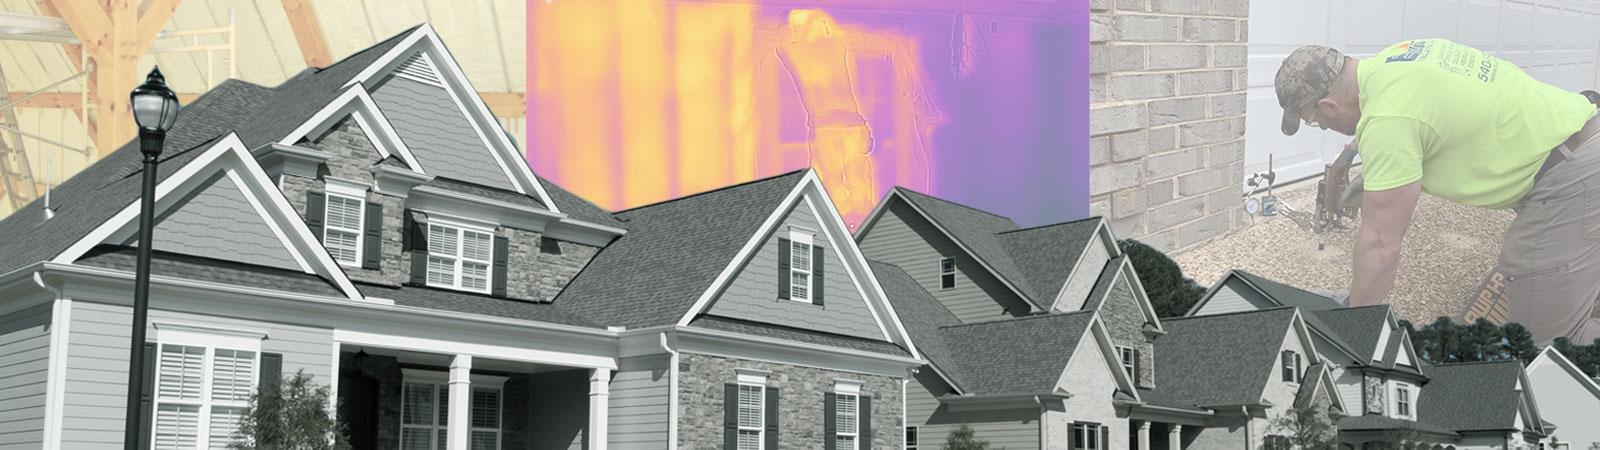 Elite Insulation and PolyPro LLC spray foam insulation contractors in Virginia